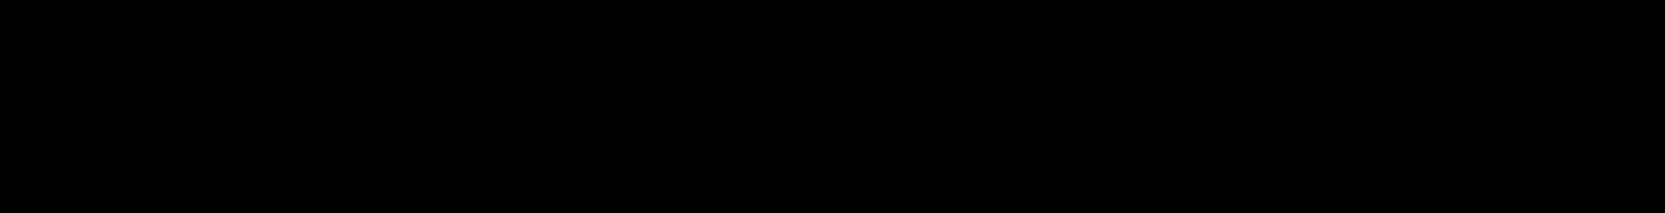 Sourdoreille